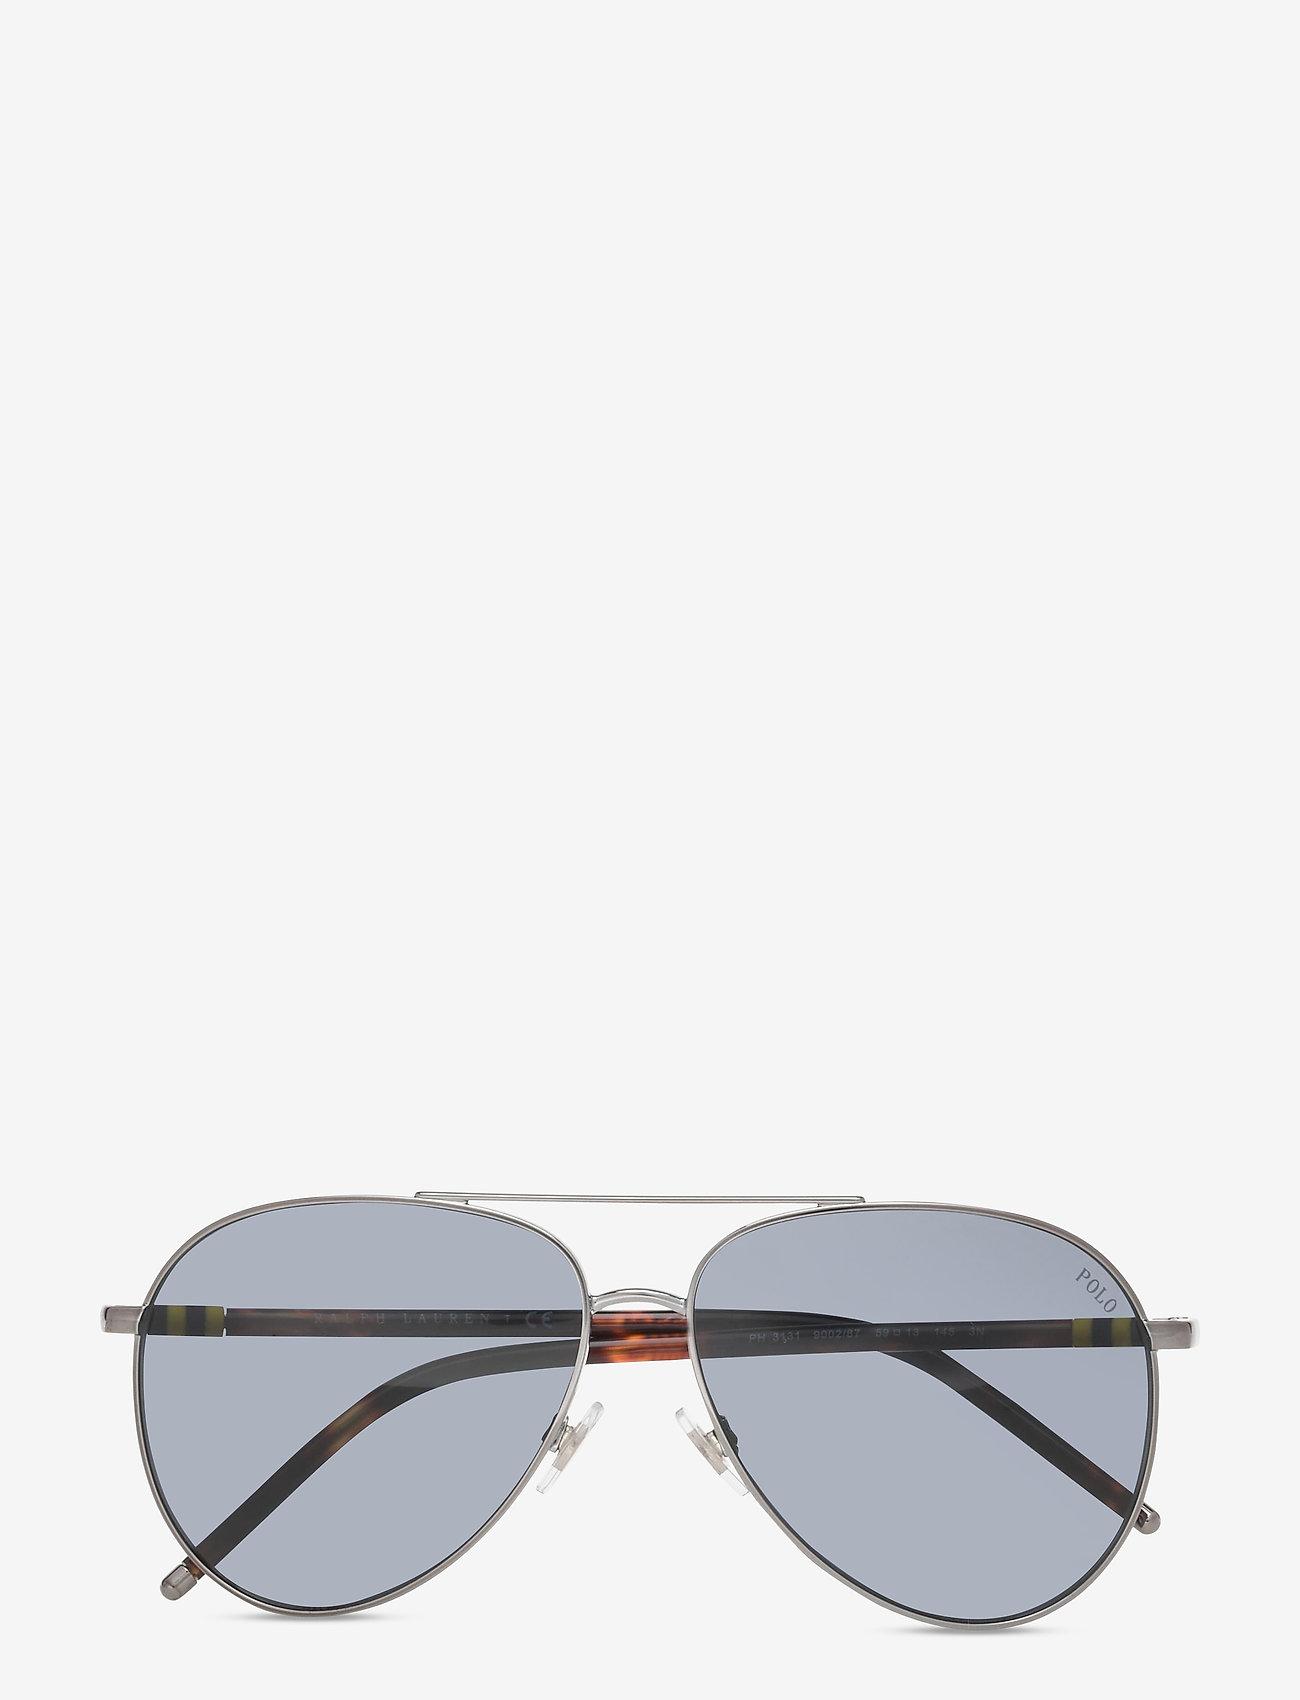 Polo Ralph Lauren - Sunglasses - pilot - grey/blue - 0